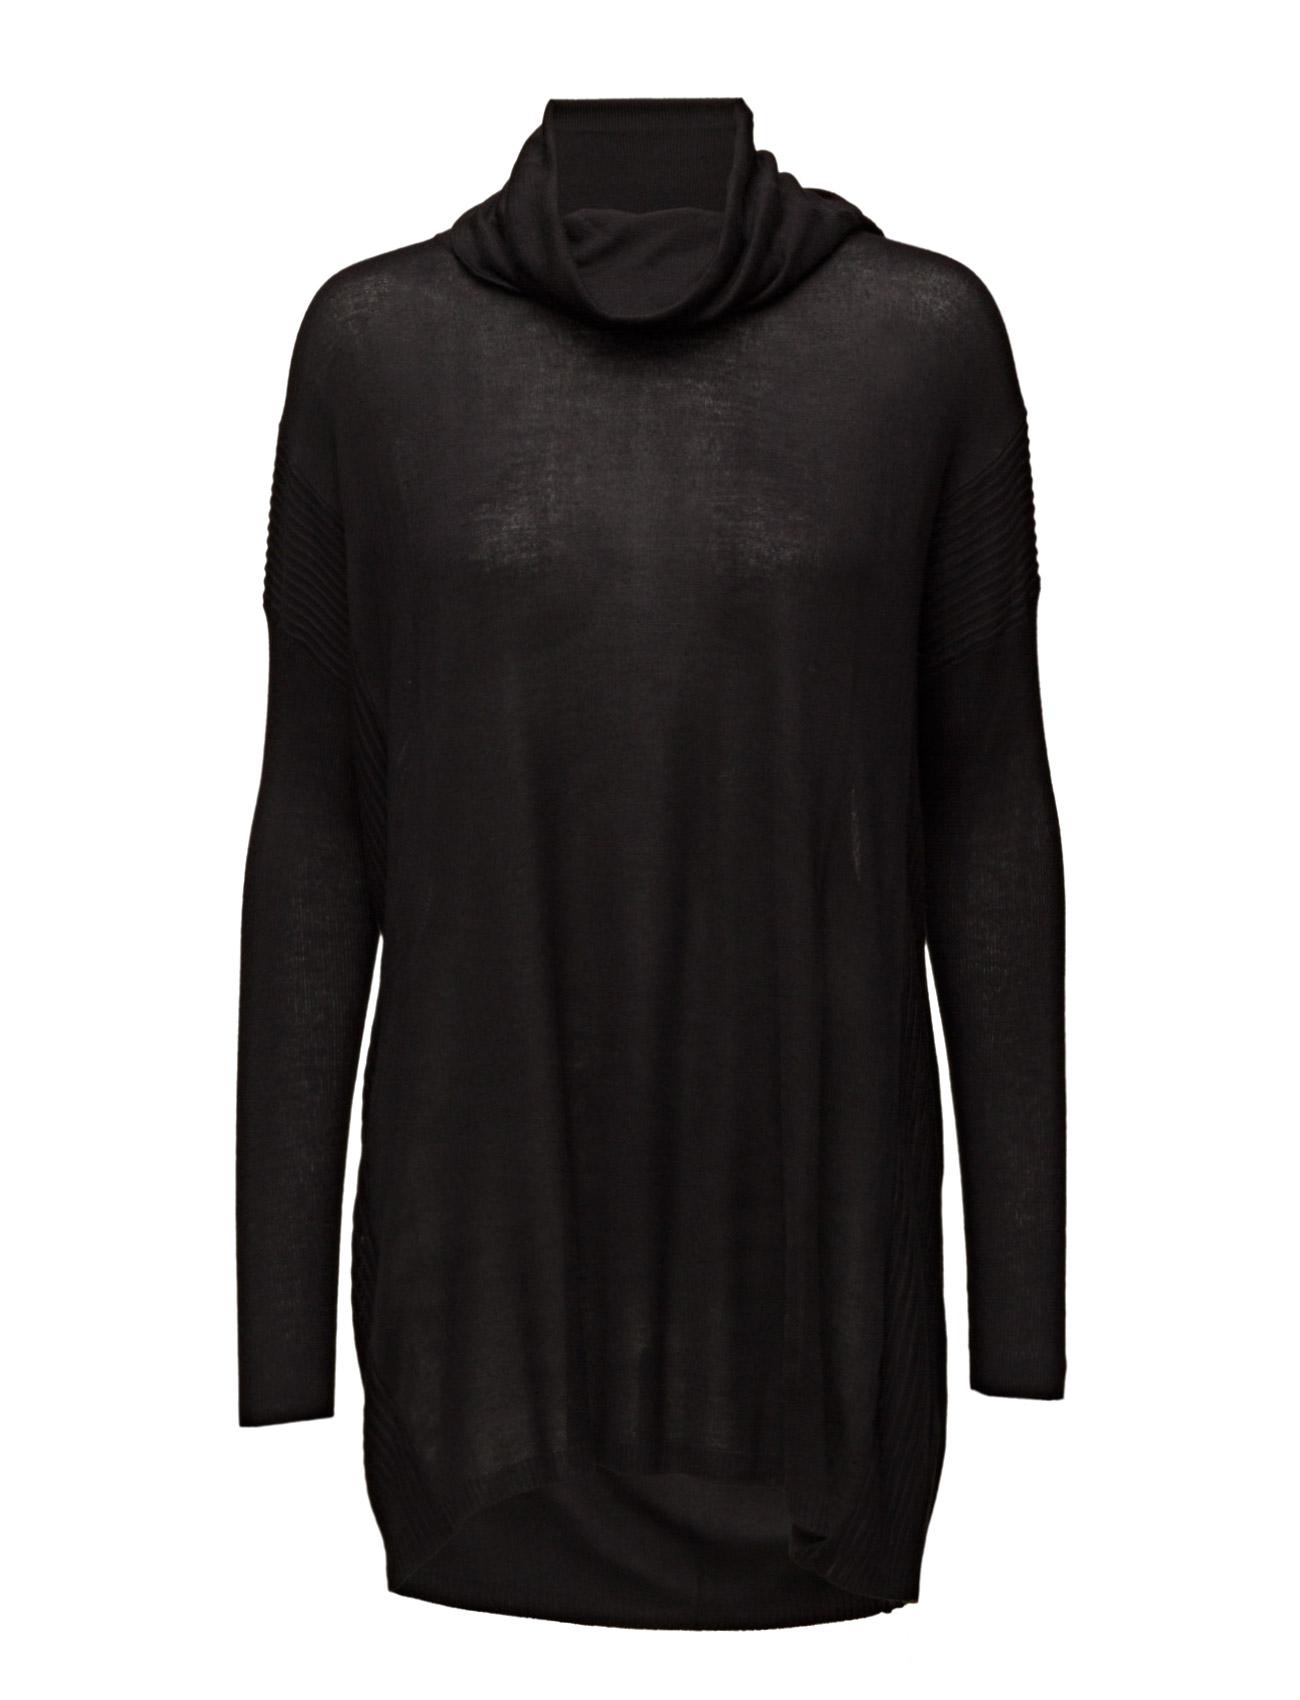 Oversize Sweater Saint Tropez Striktøj til Damer i Sort